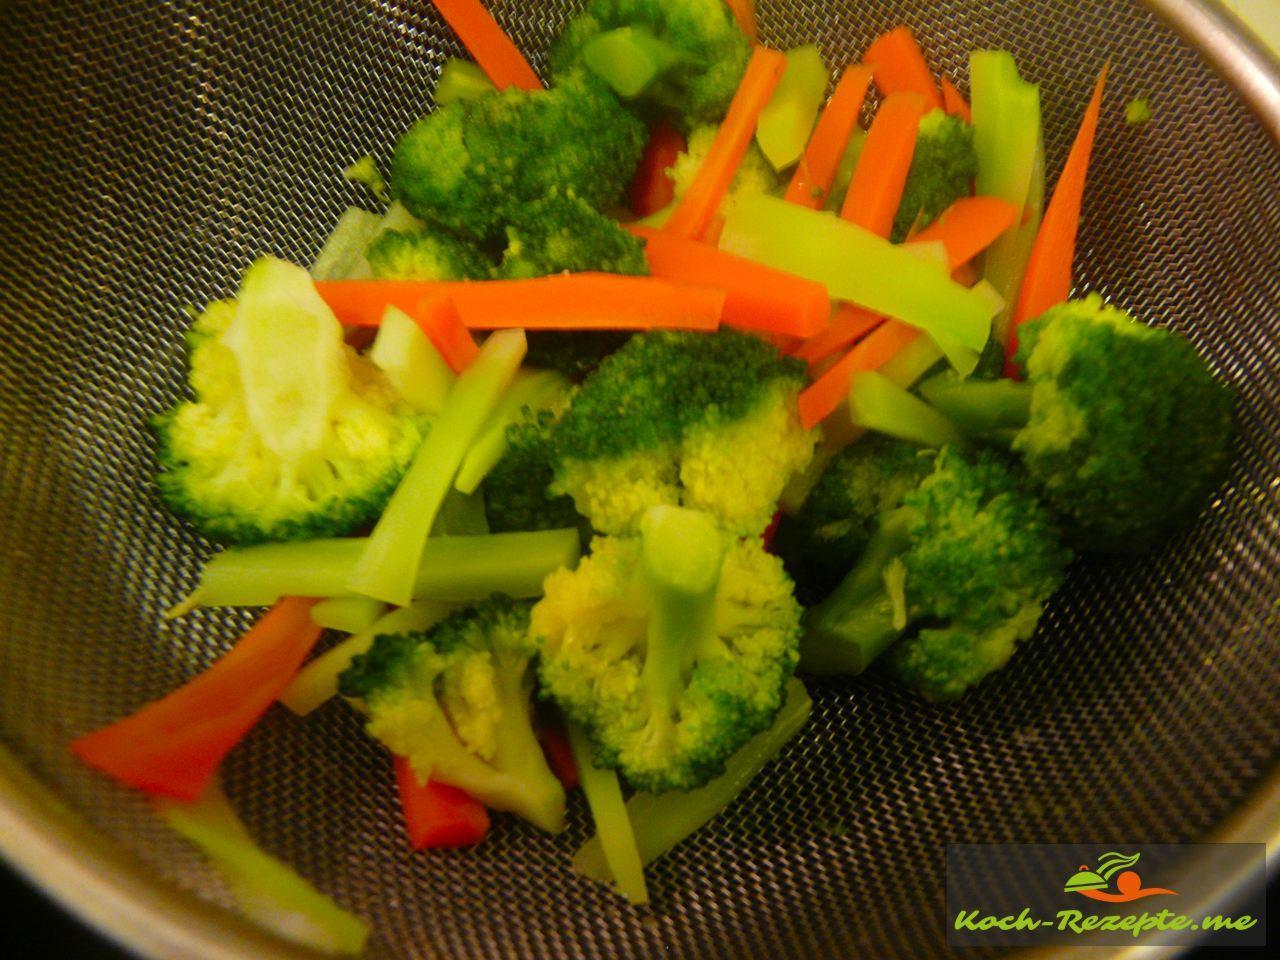 Das Fertige Gemüse Rezept für Asia Nudeln mit Brokkoli Gemüse